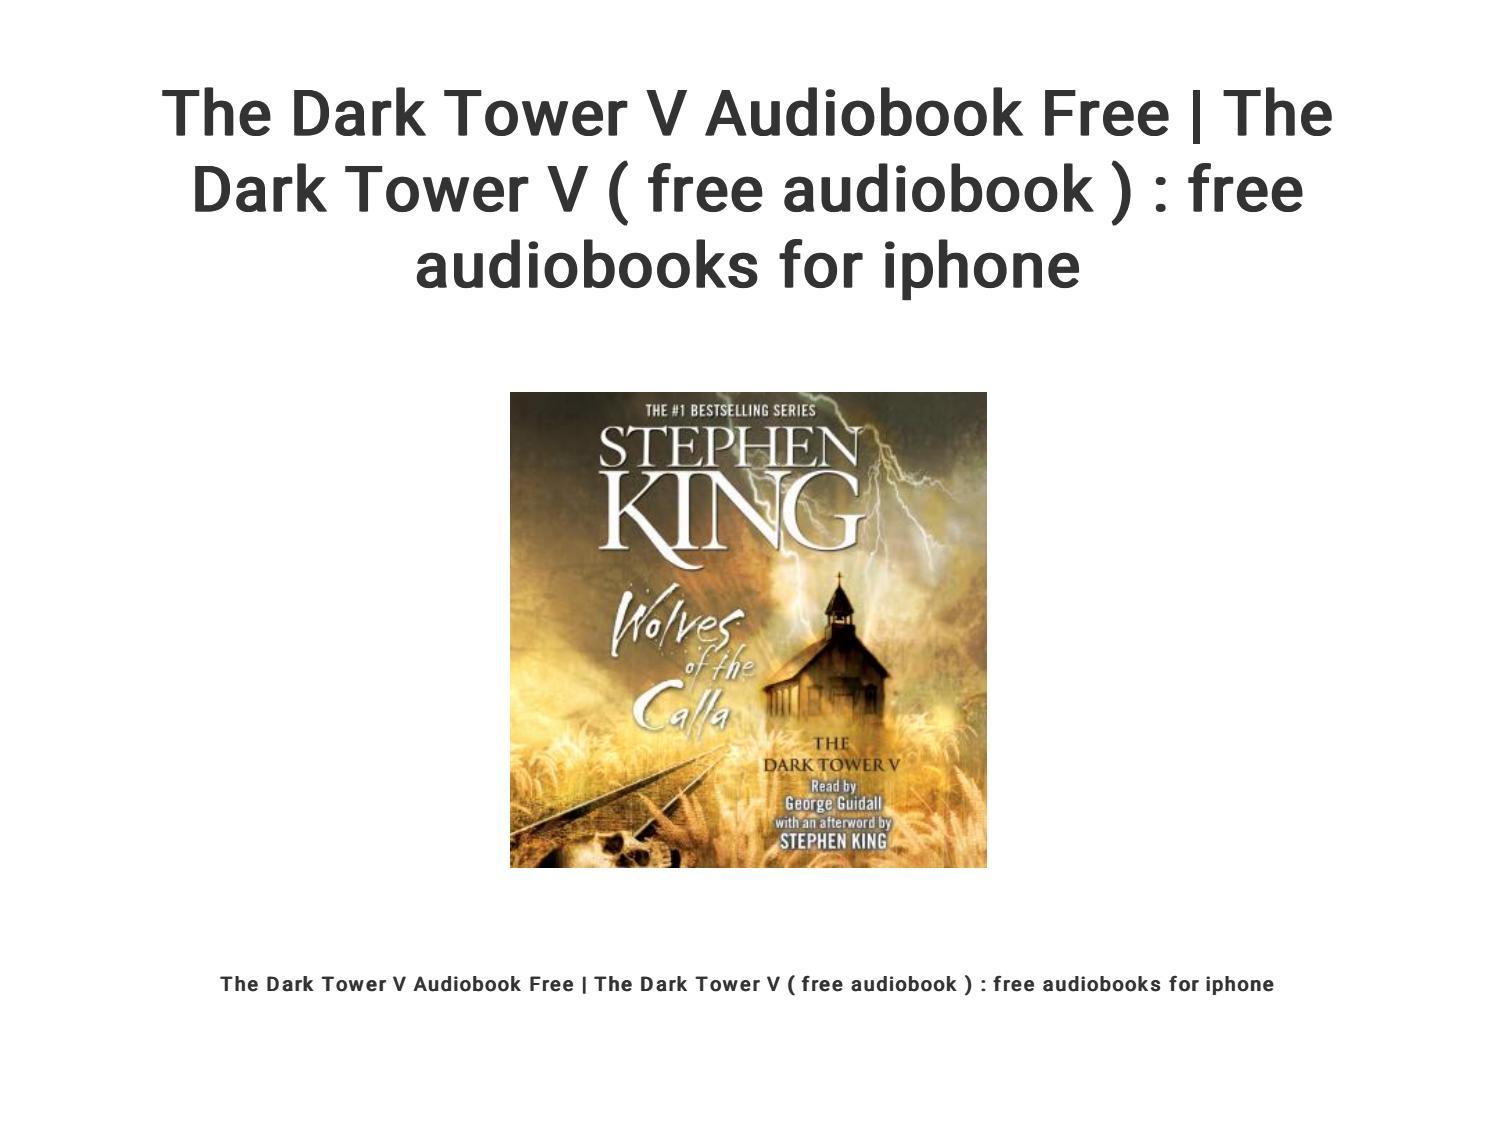 The Dark Tower V Audiobook Free   The Dark Tower V ( free